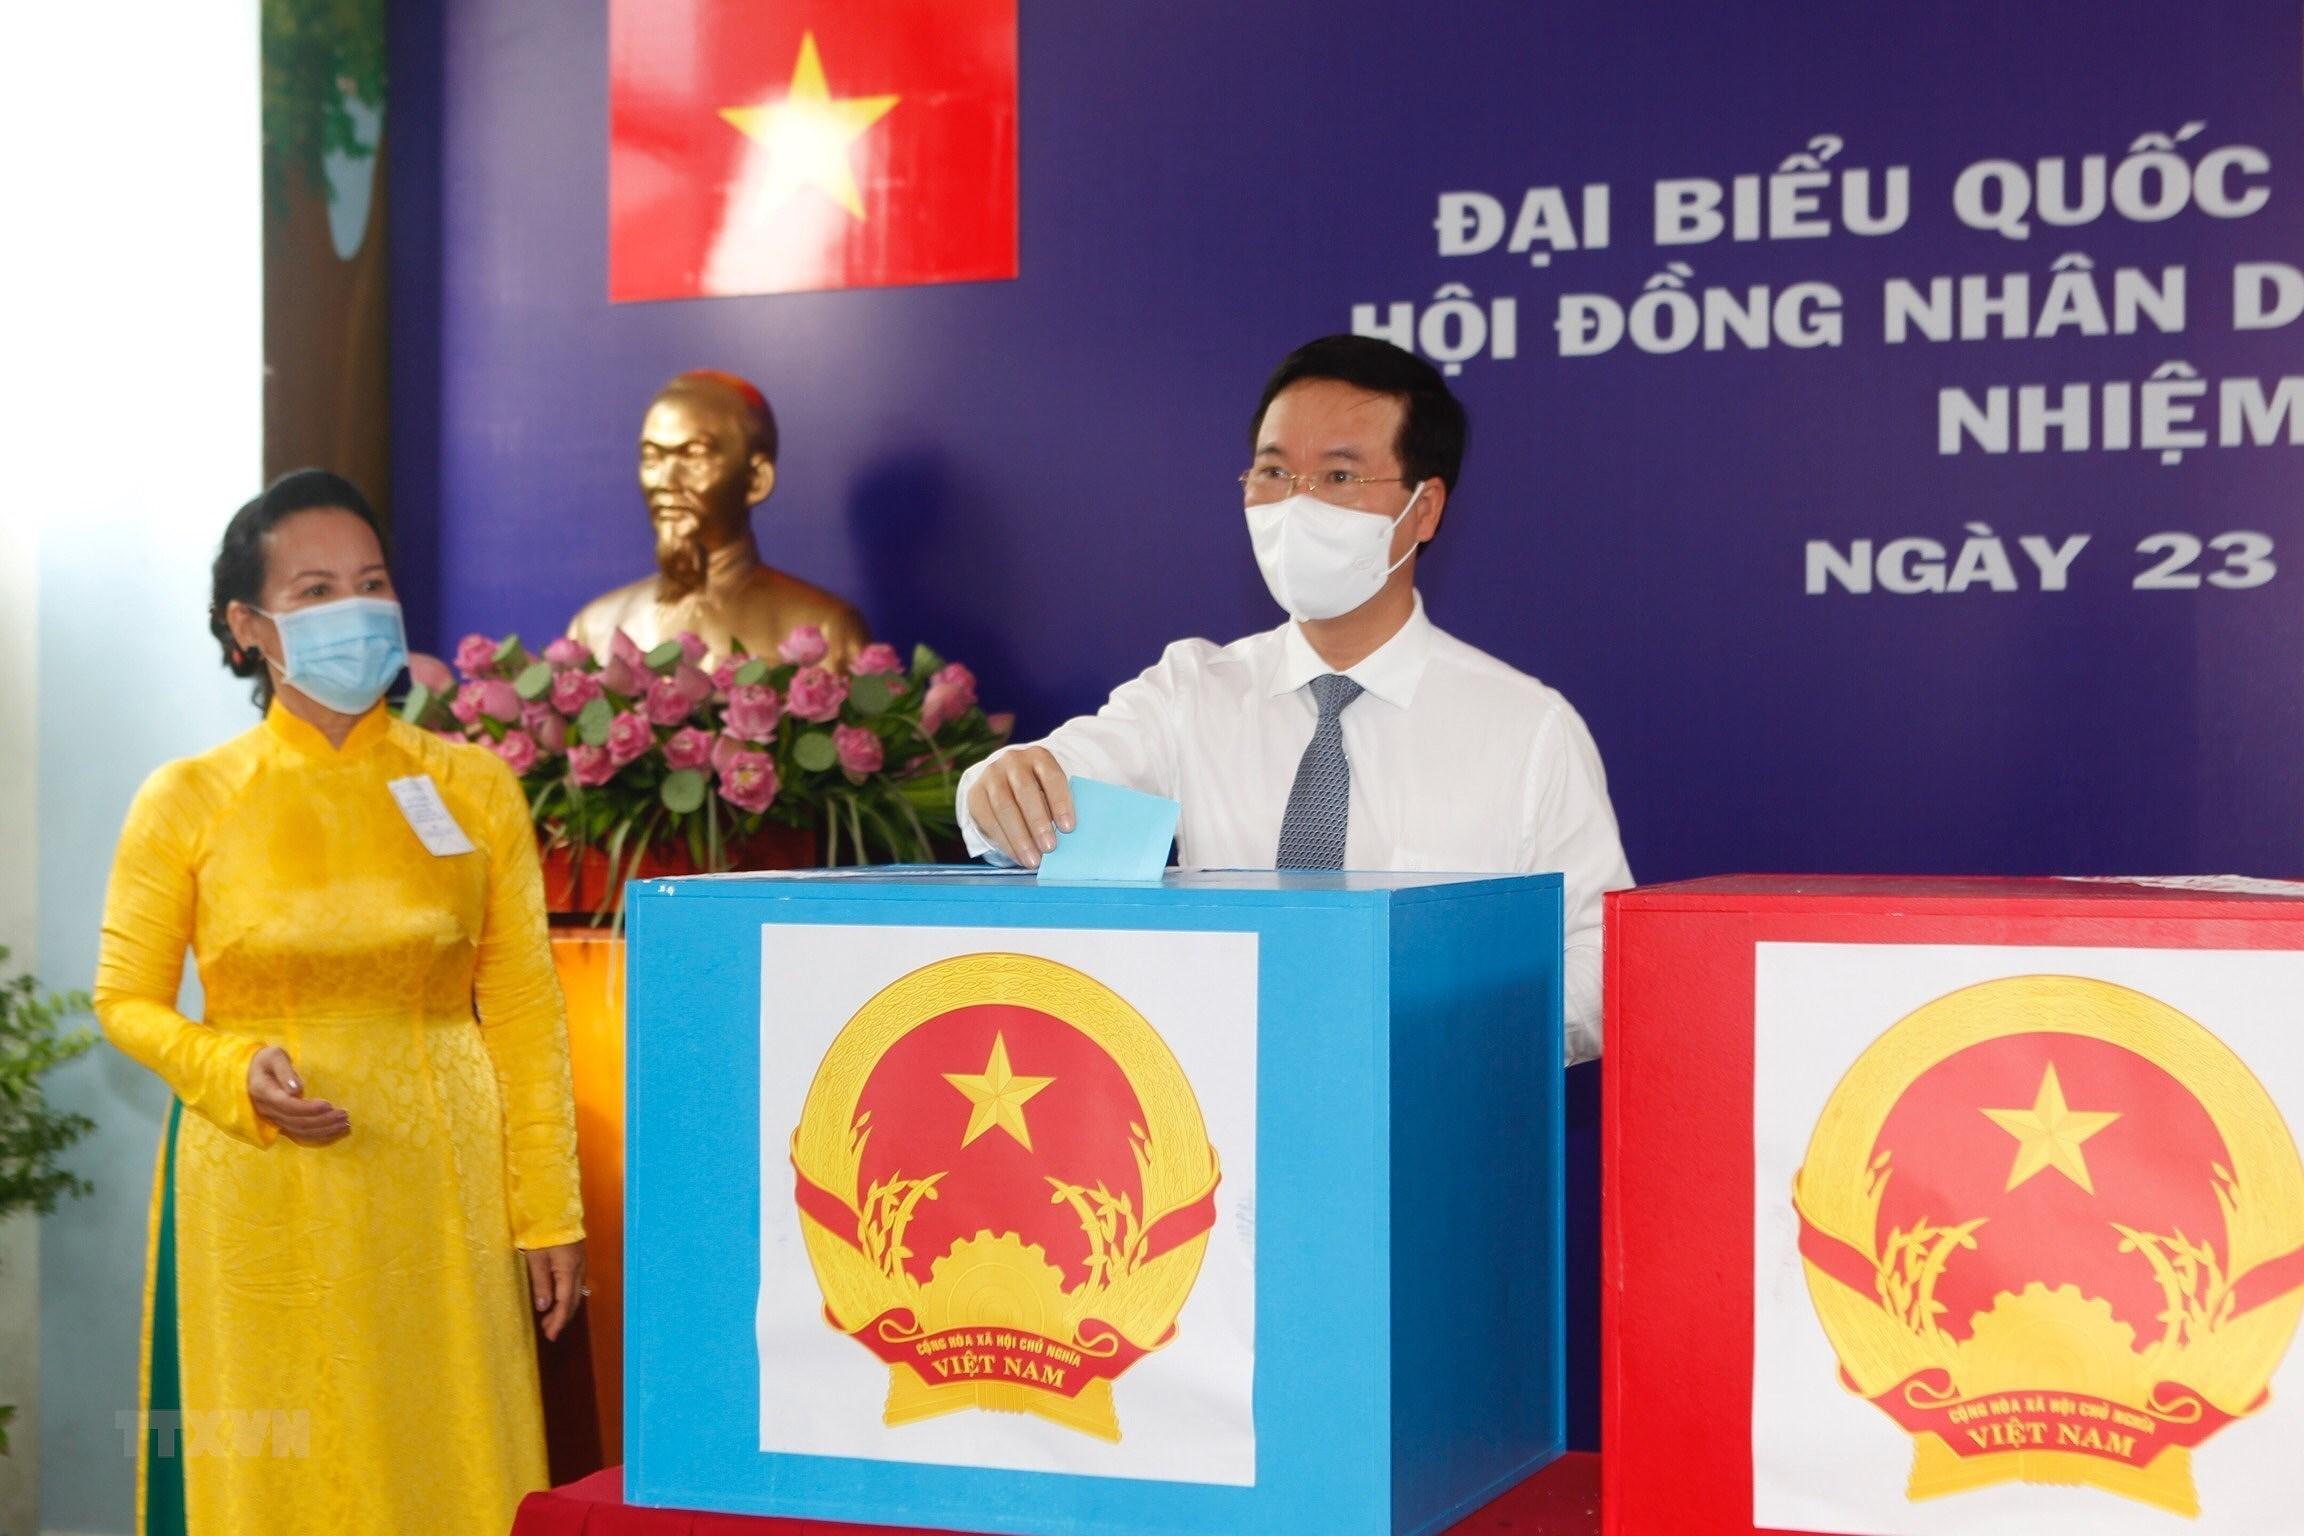 Cu tri TP.HCM, Vinh Long, Soc Trang, Quang Ngai no nuc di bau cu hinh anh 1